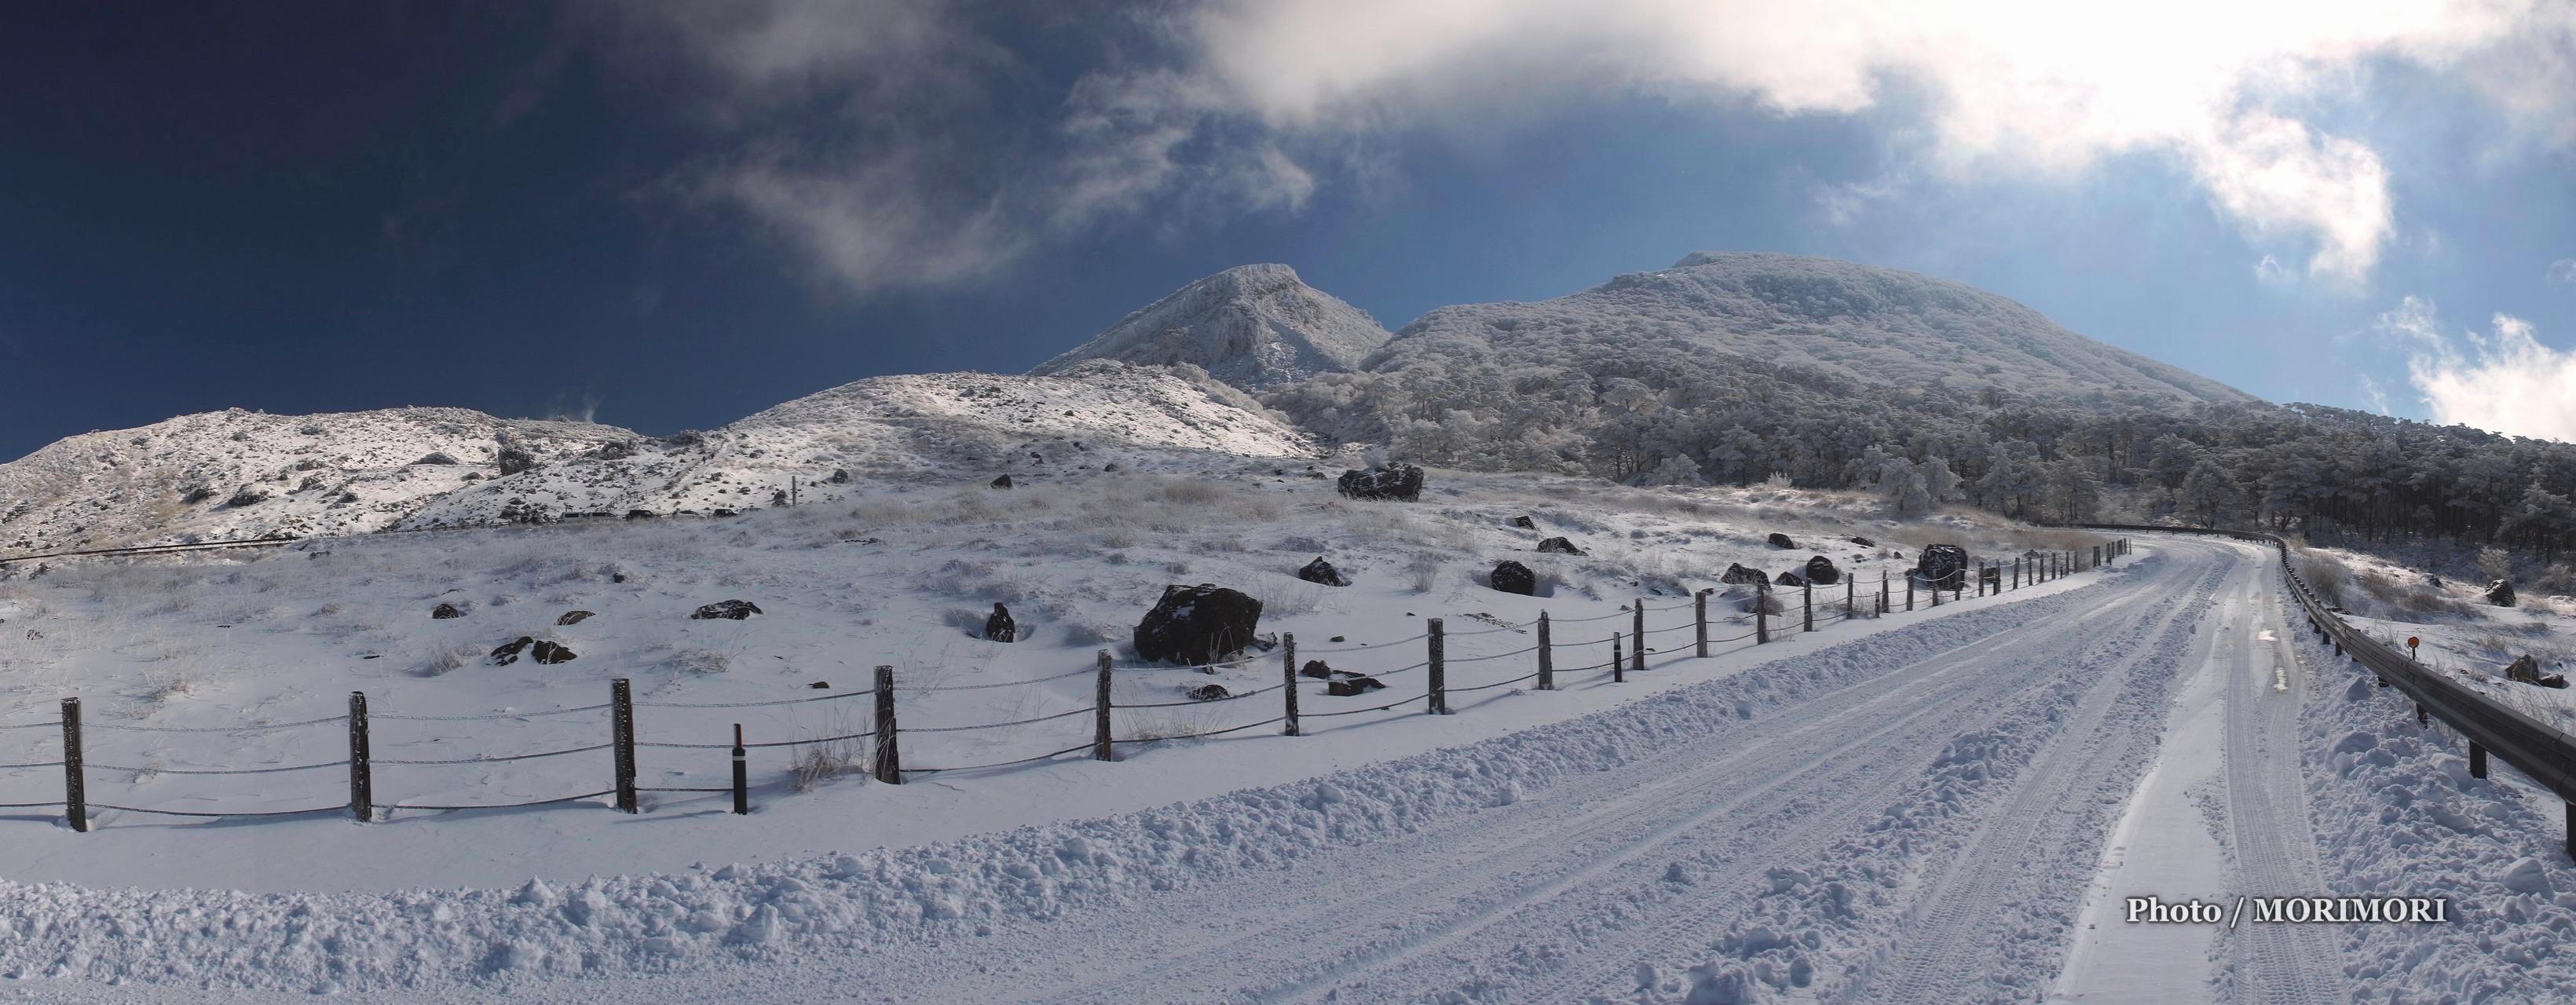 818e80999a 2016年1月20日 積雪したえびの高原